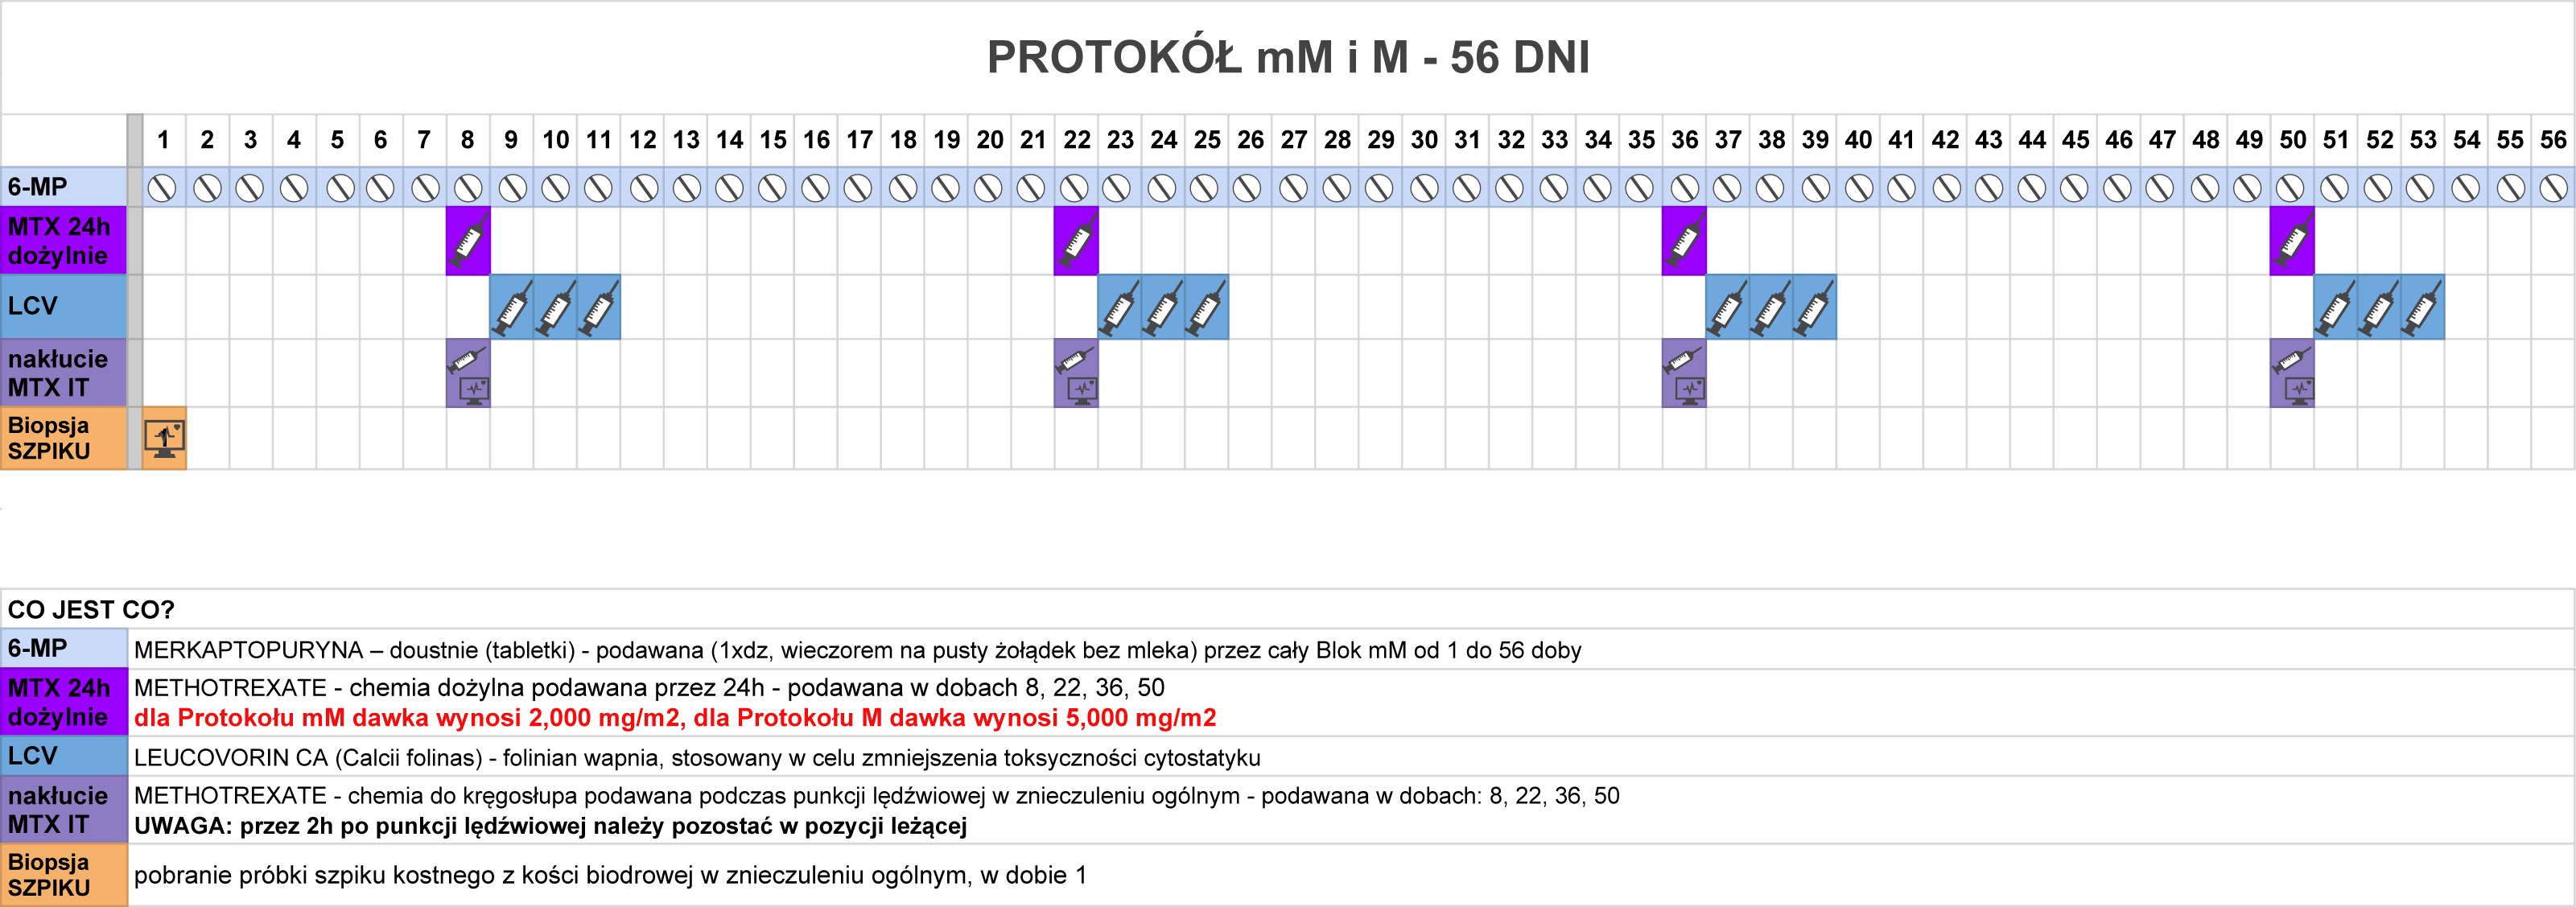 protokol-mm